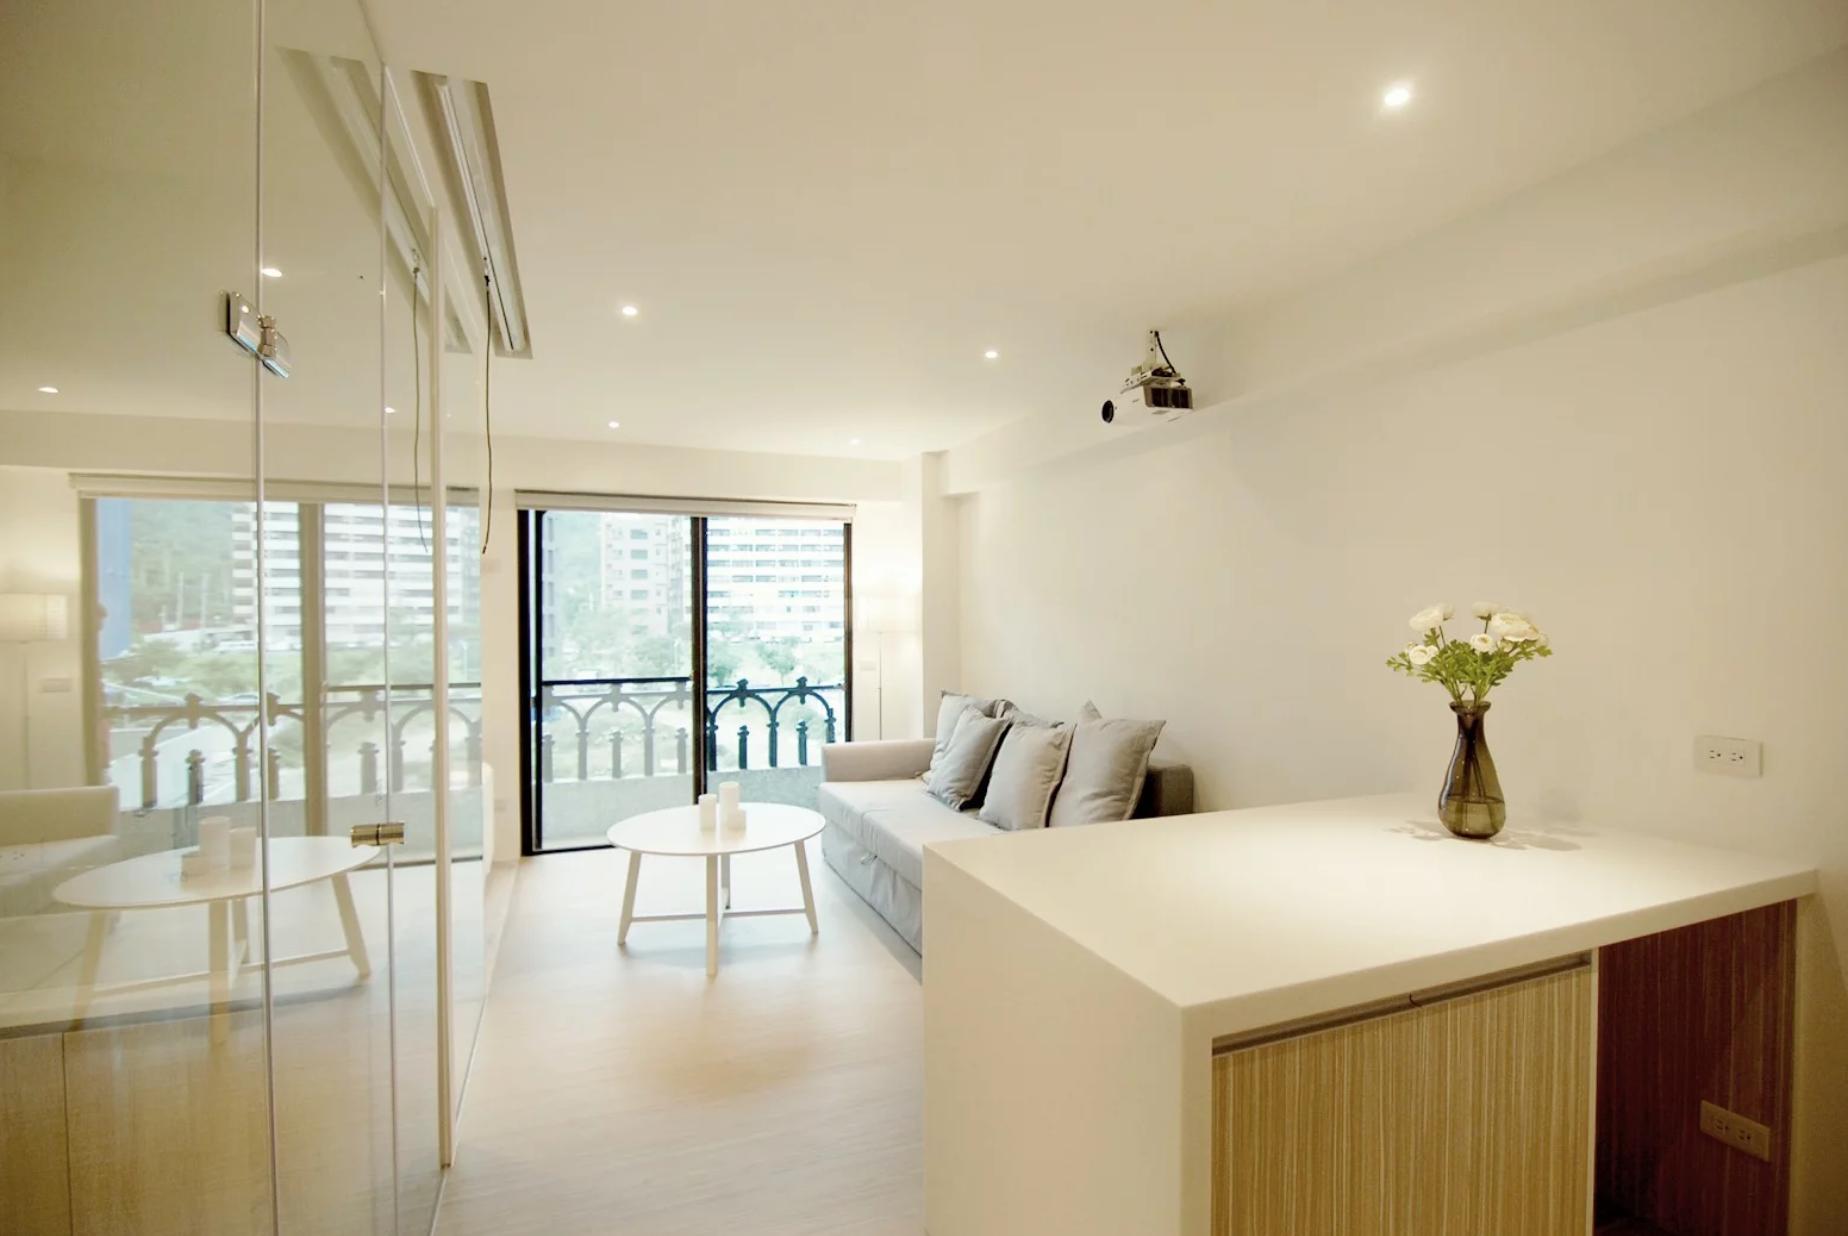 德築-DEZU-project-礁溪套房裝修-architecture-interior-renovation-9